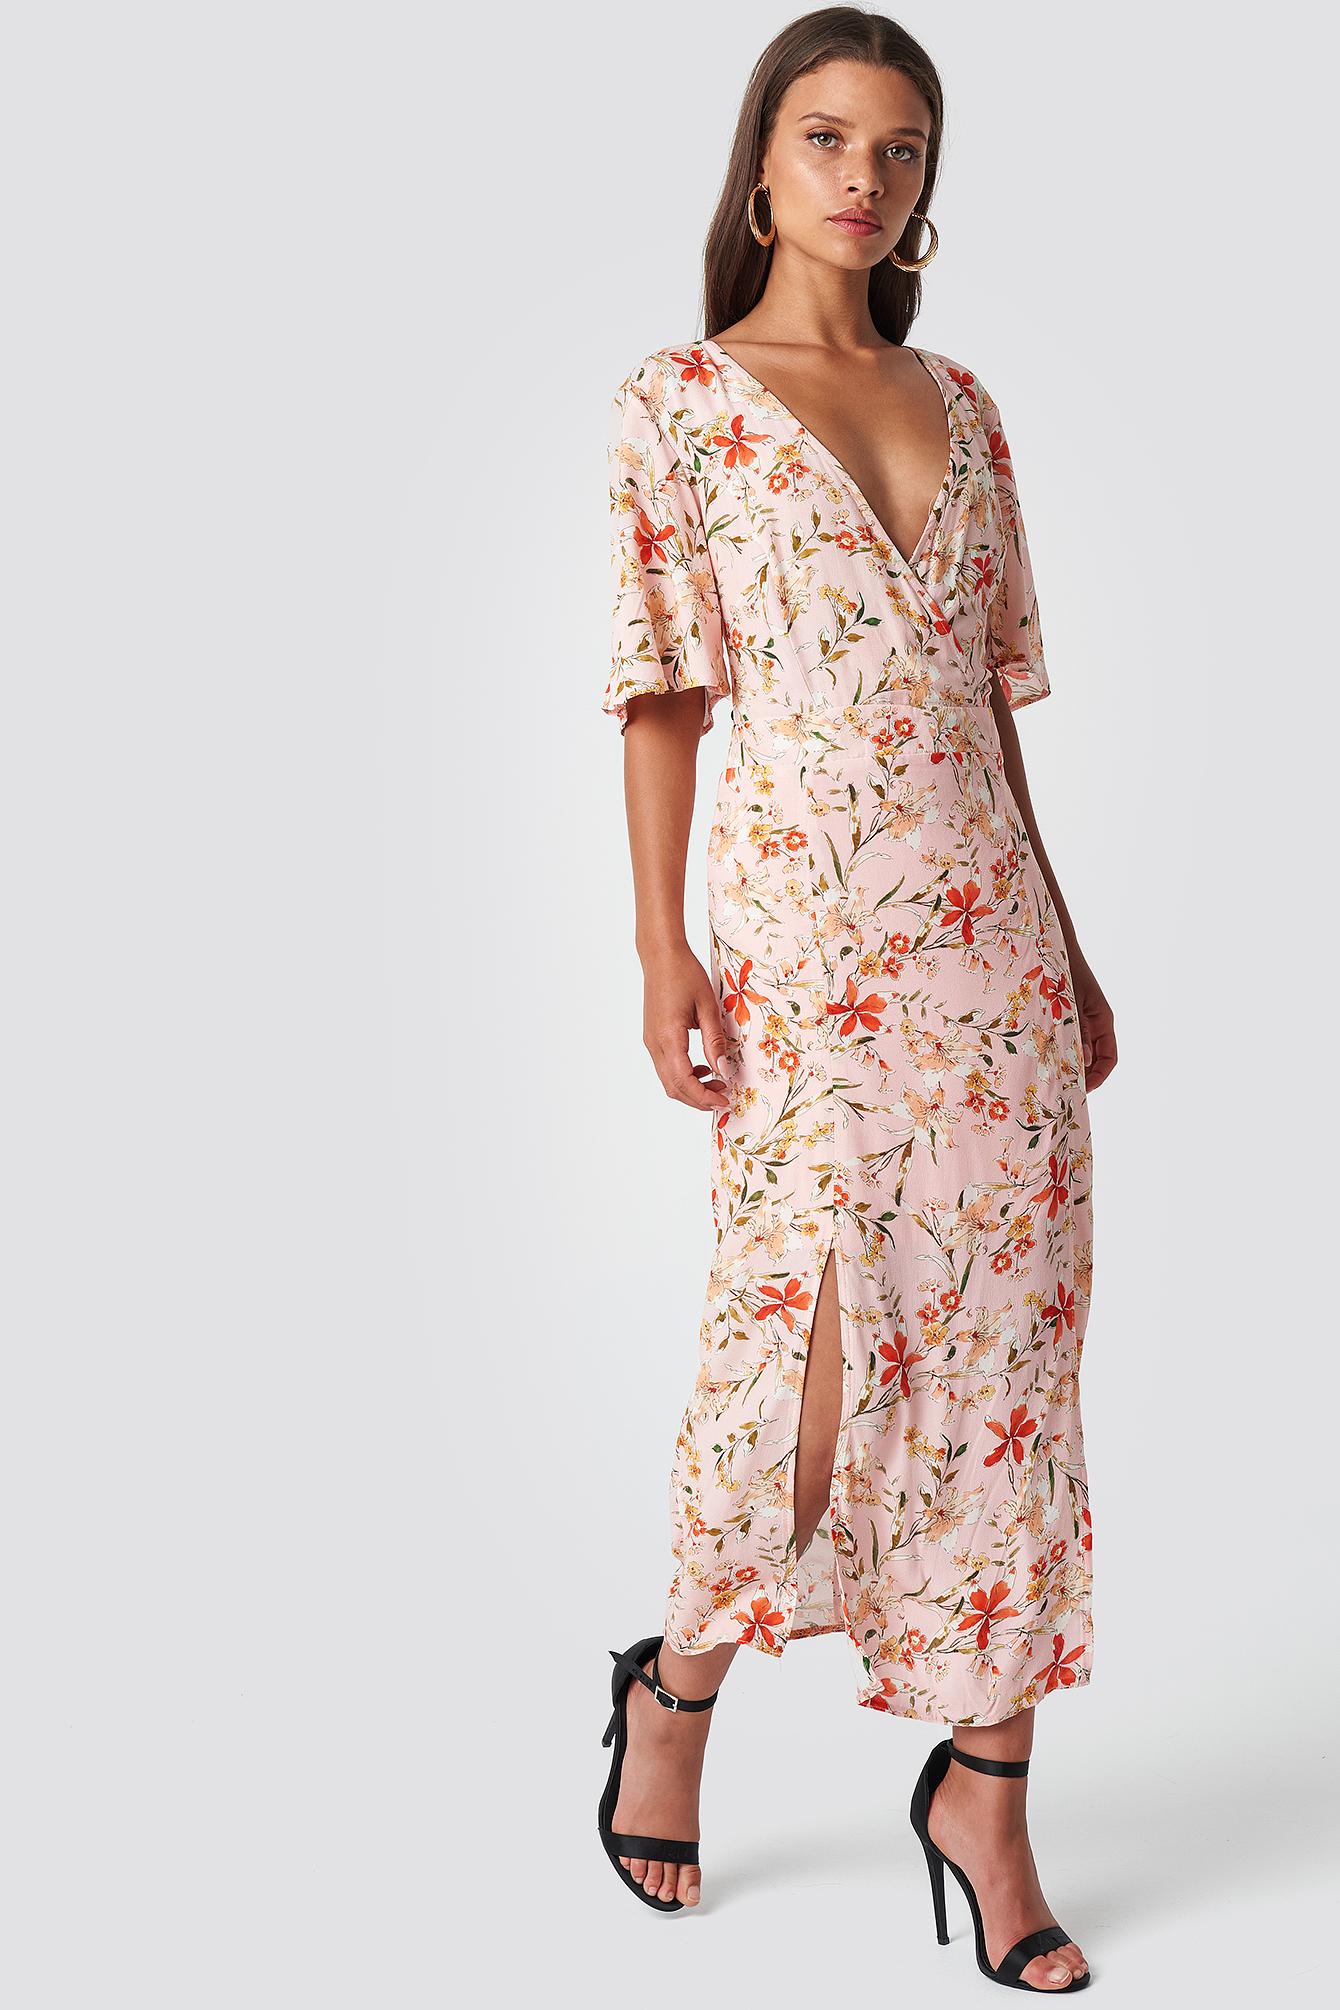 TRENDYOL FLOWER PATTERNED CRUISE DRESS - PINK, MULTICOLOR